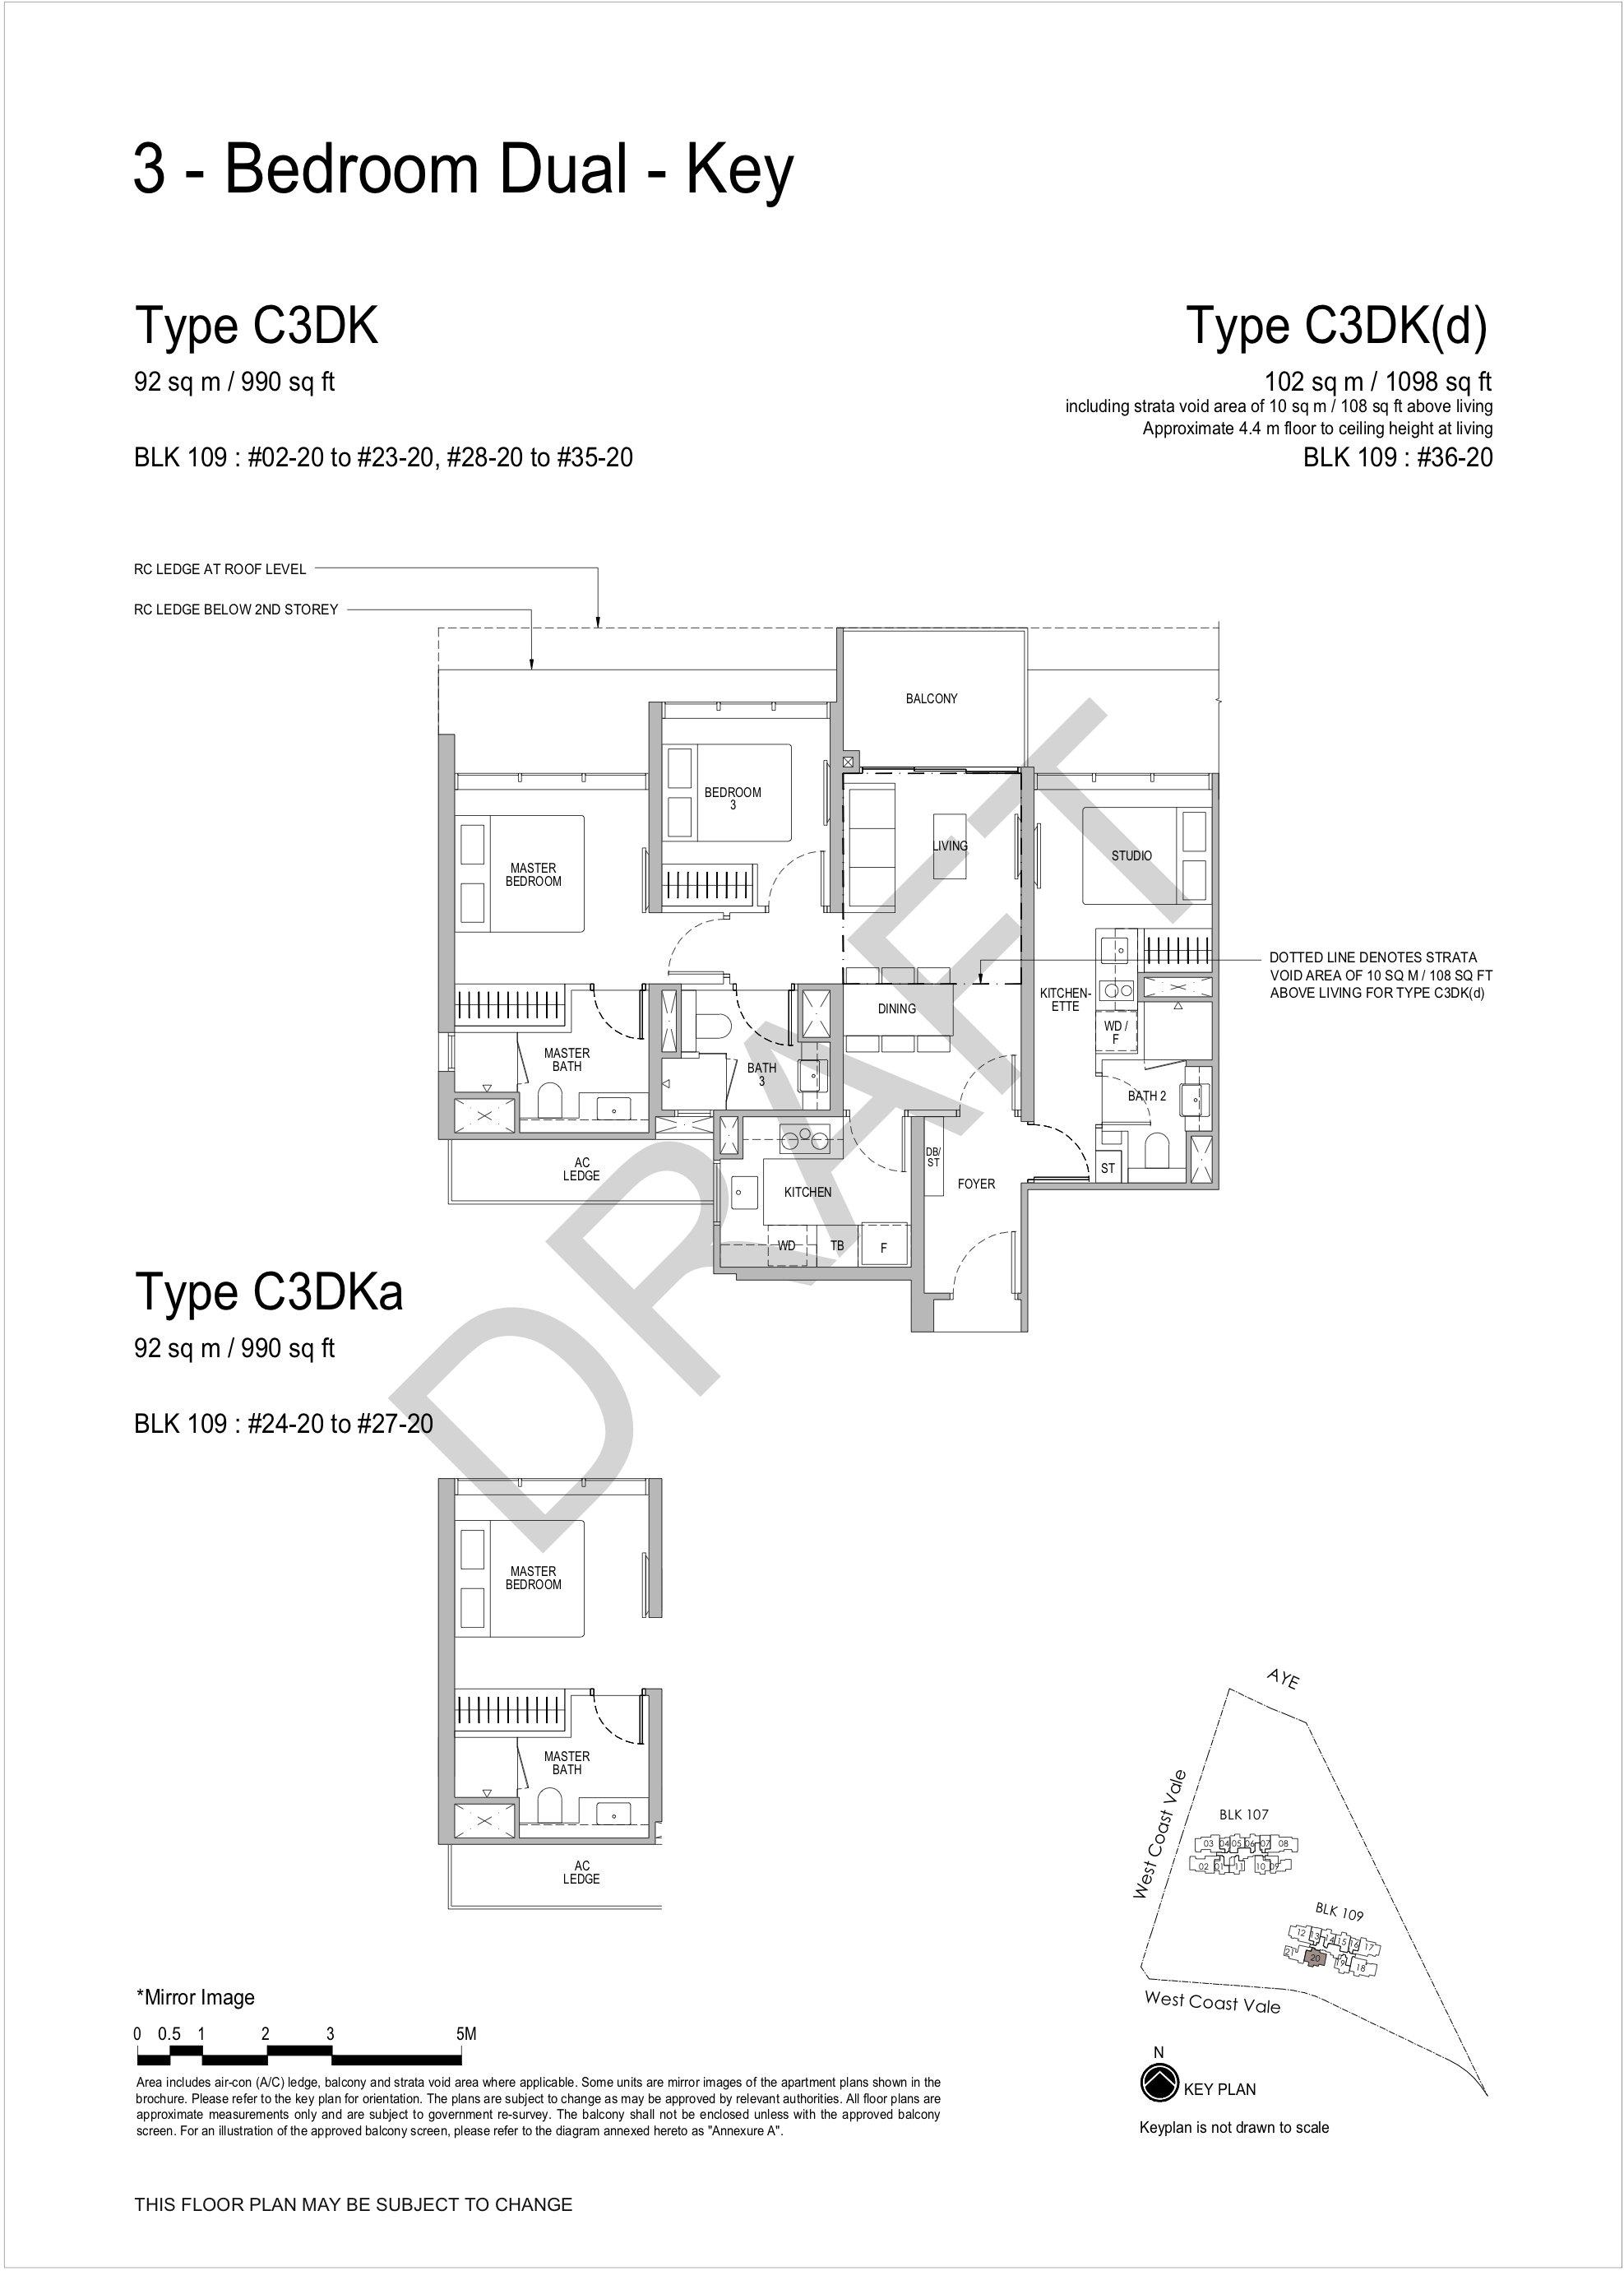 Whistler Grand 3 bedroom dual key floor plan C3DK